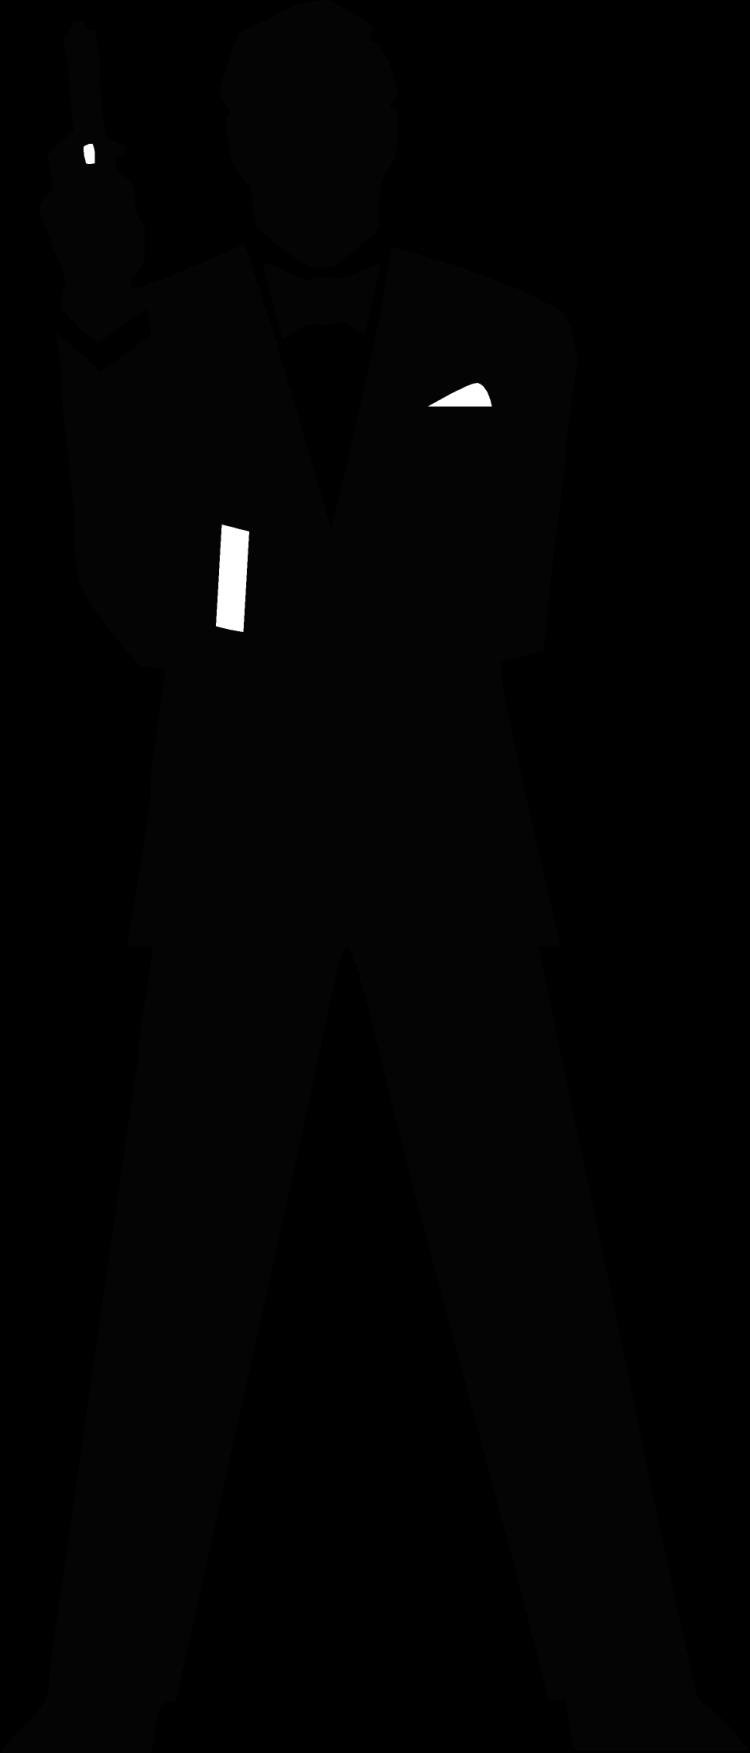 free vector James Bond Secret Agent 007 Black & White Silo